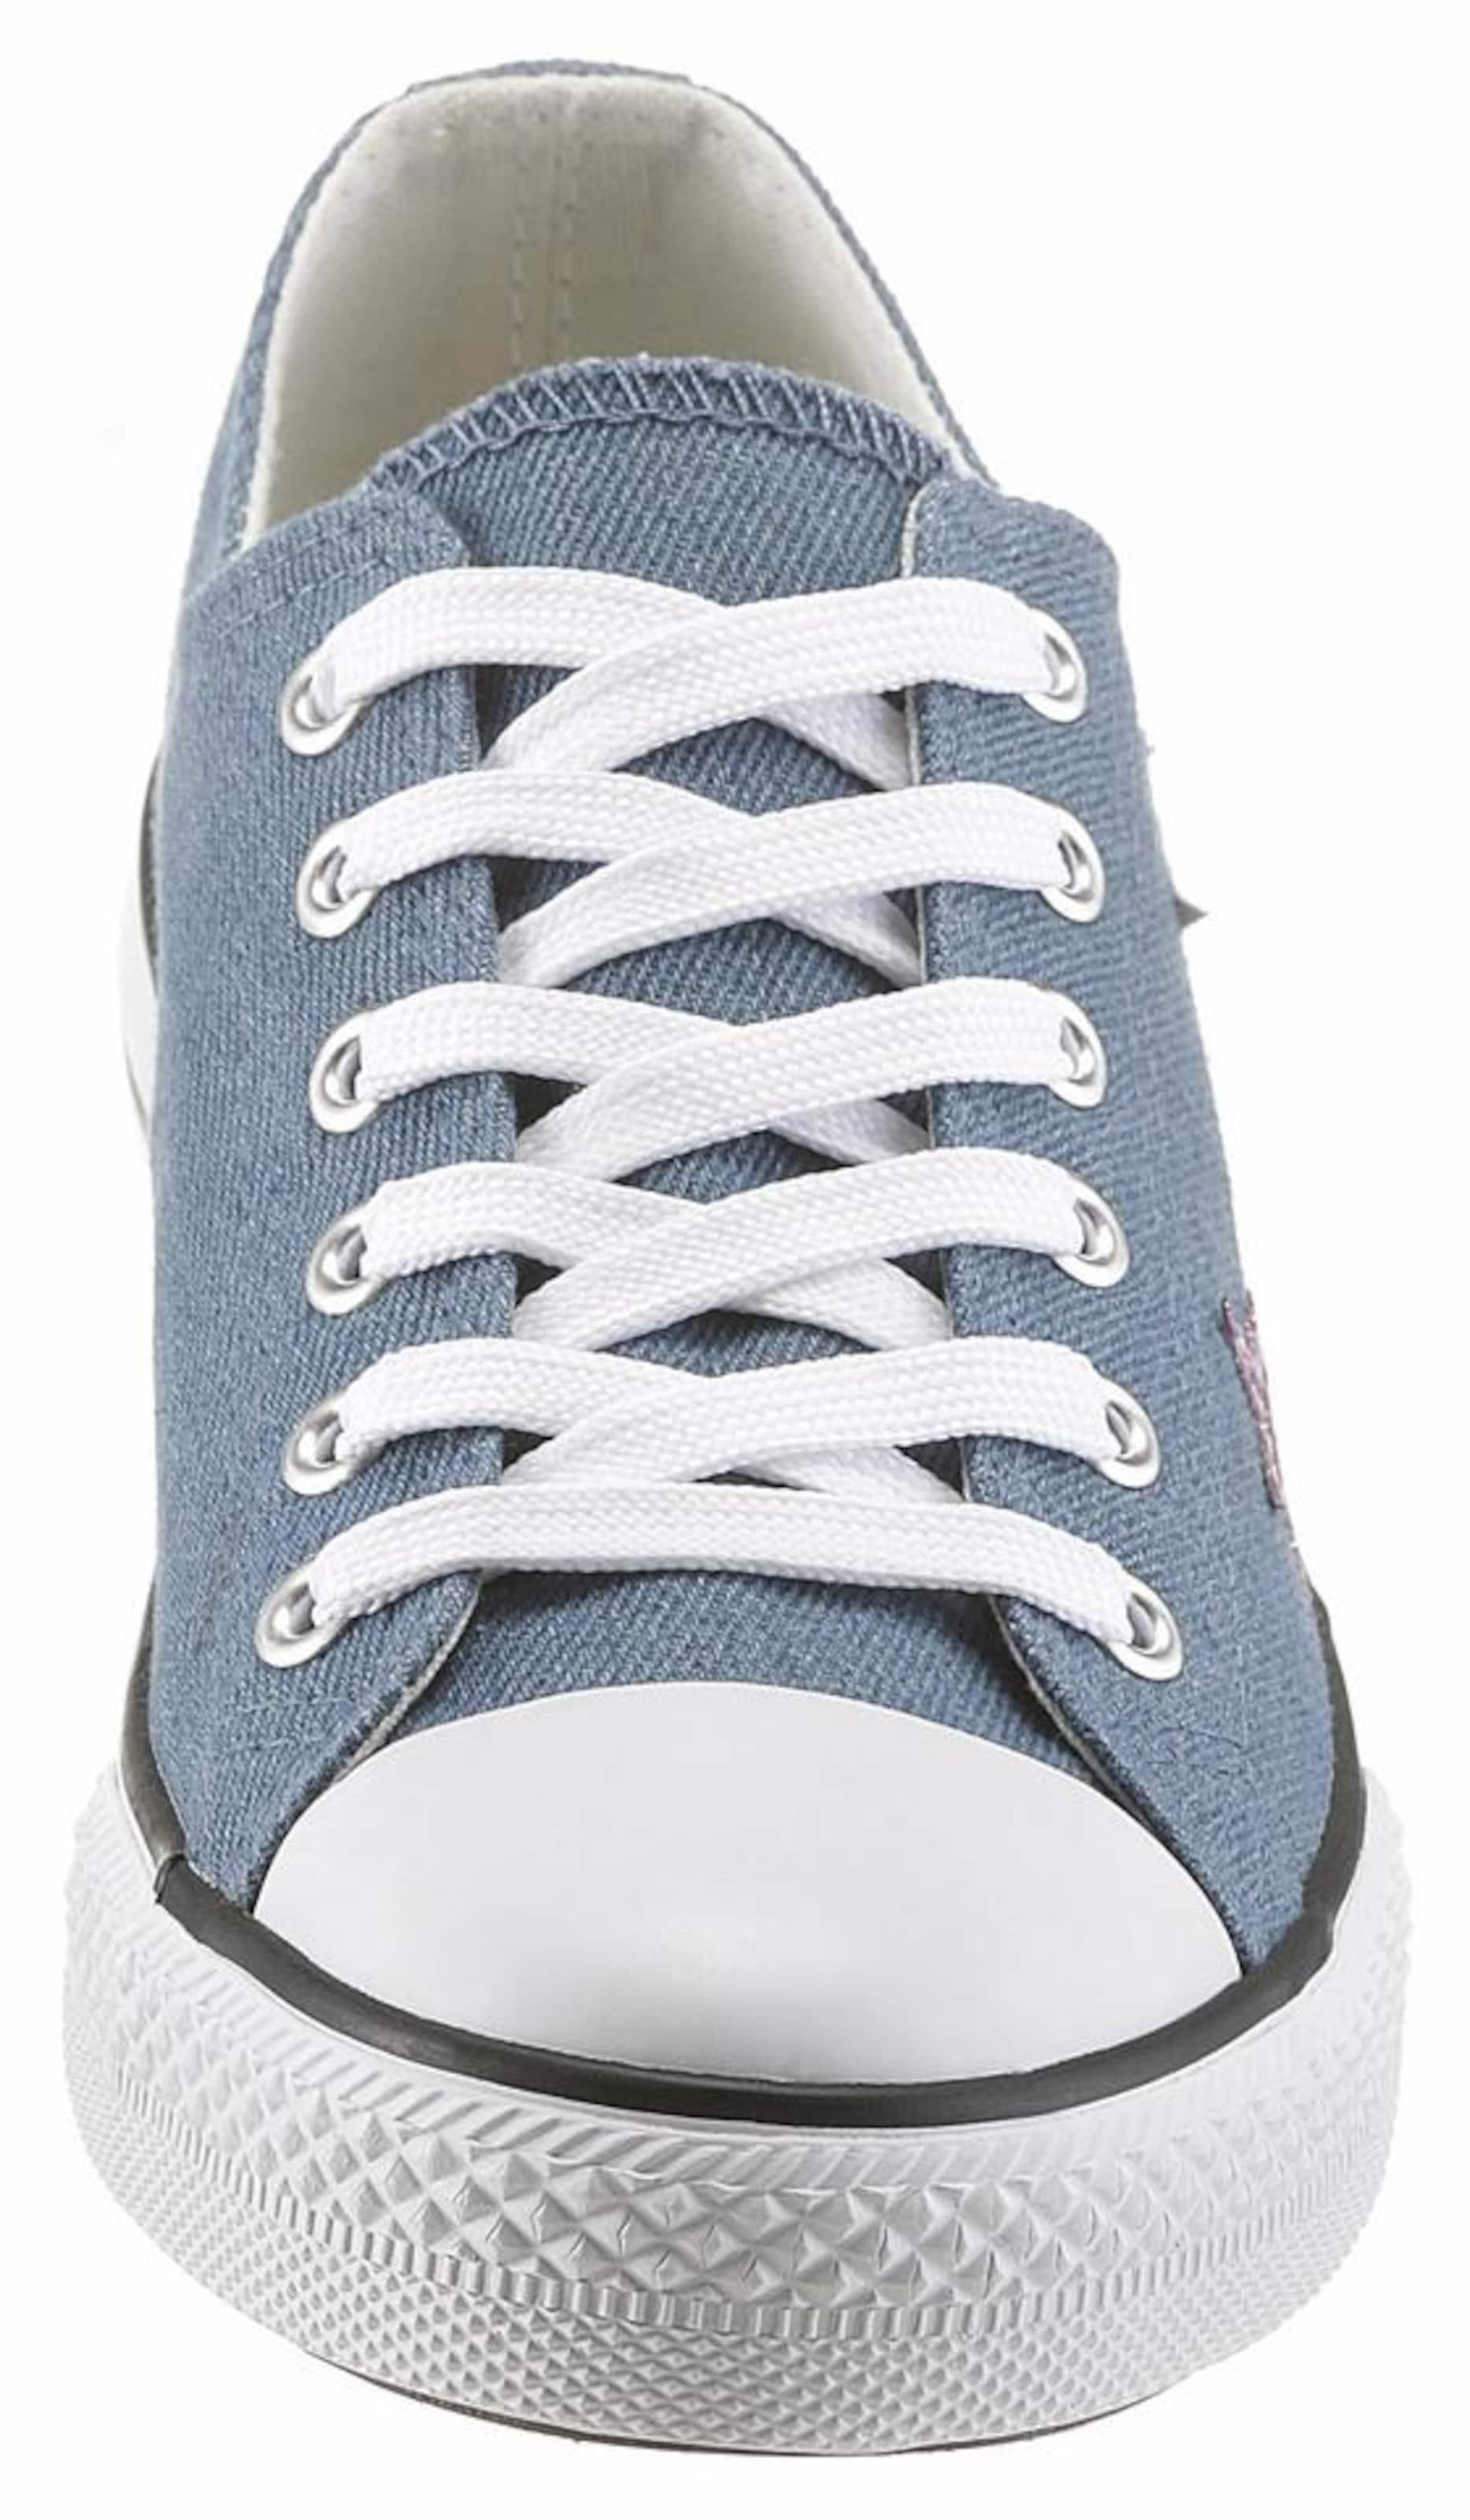 Blue In Sneaker Denim Arizona OTlwPXkZiu